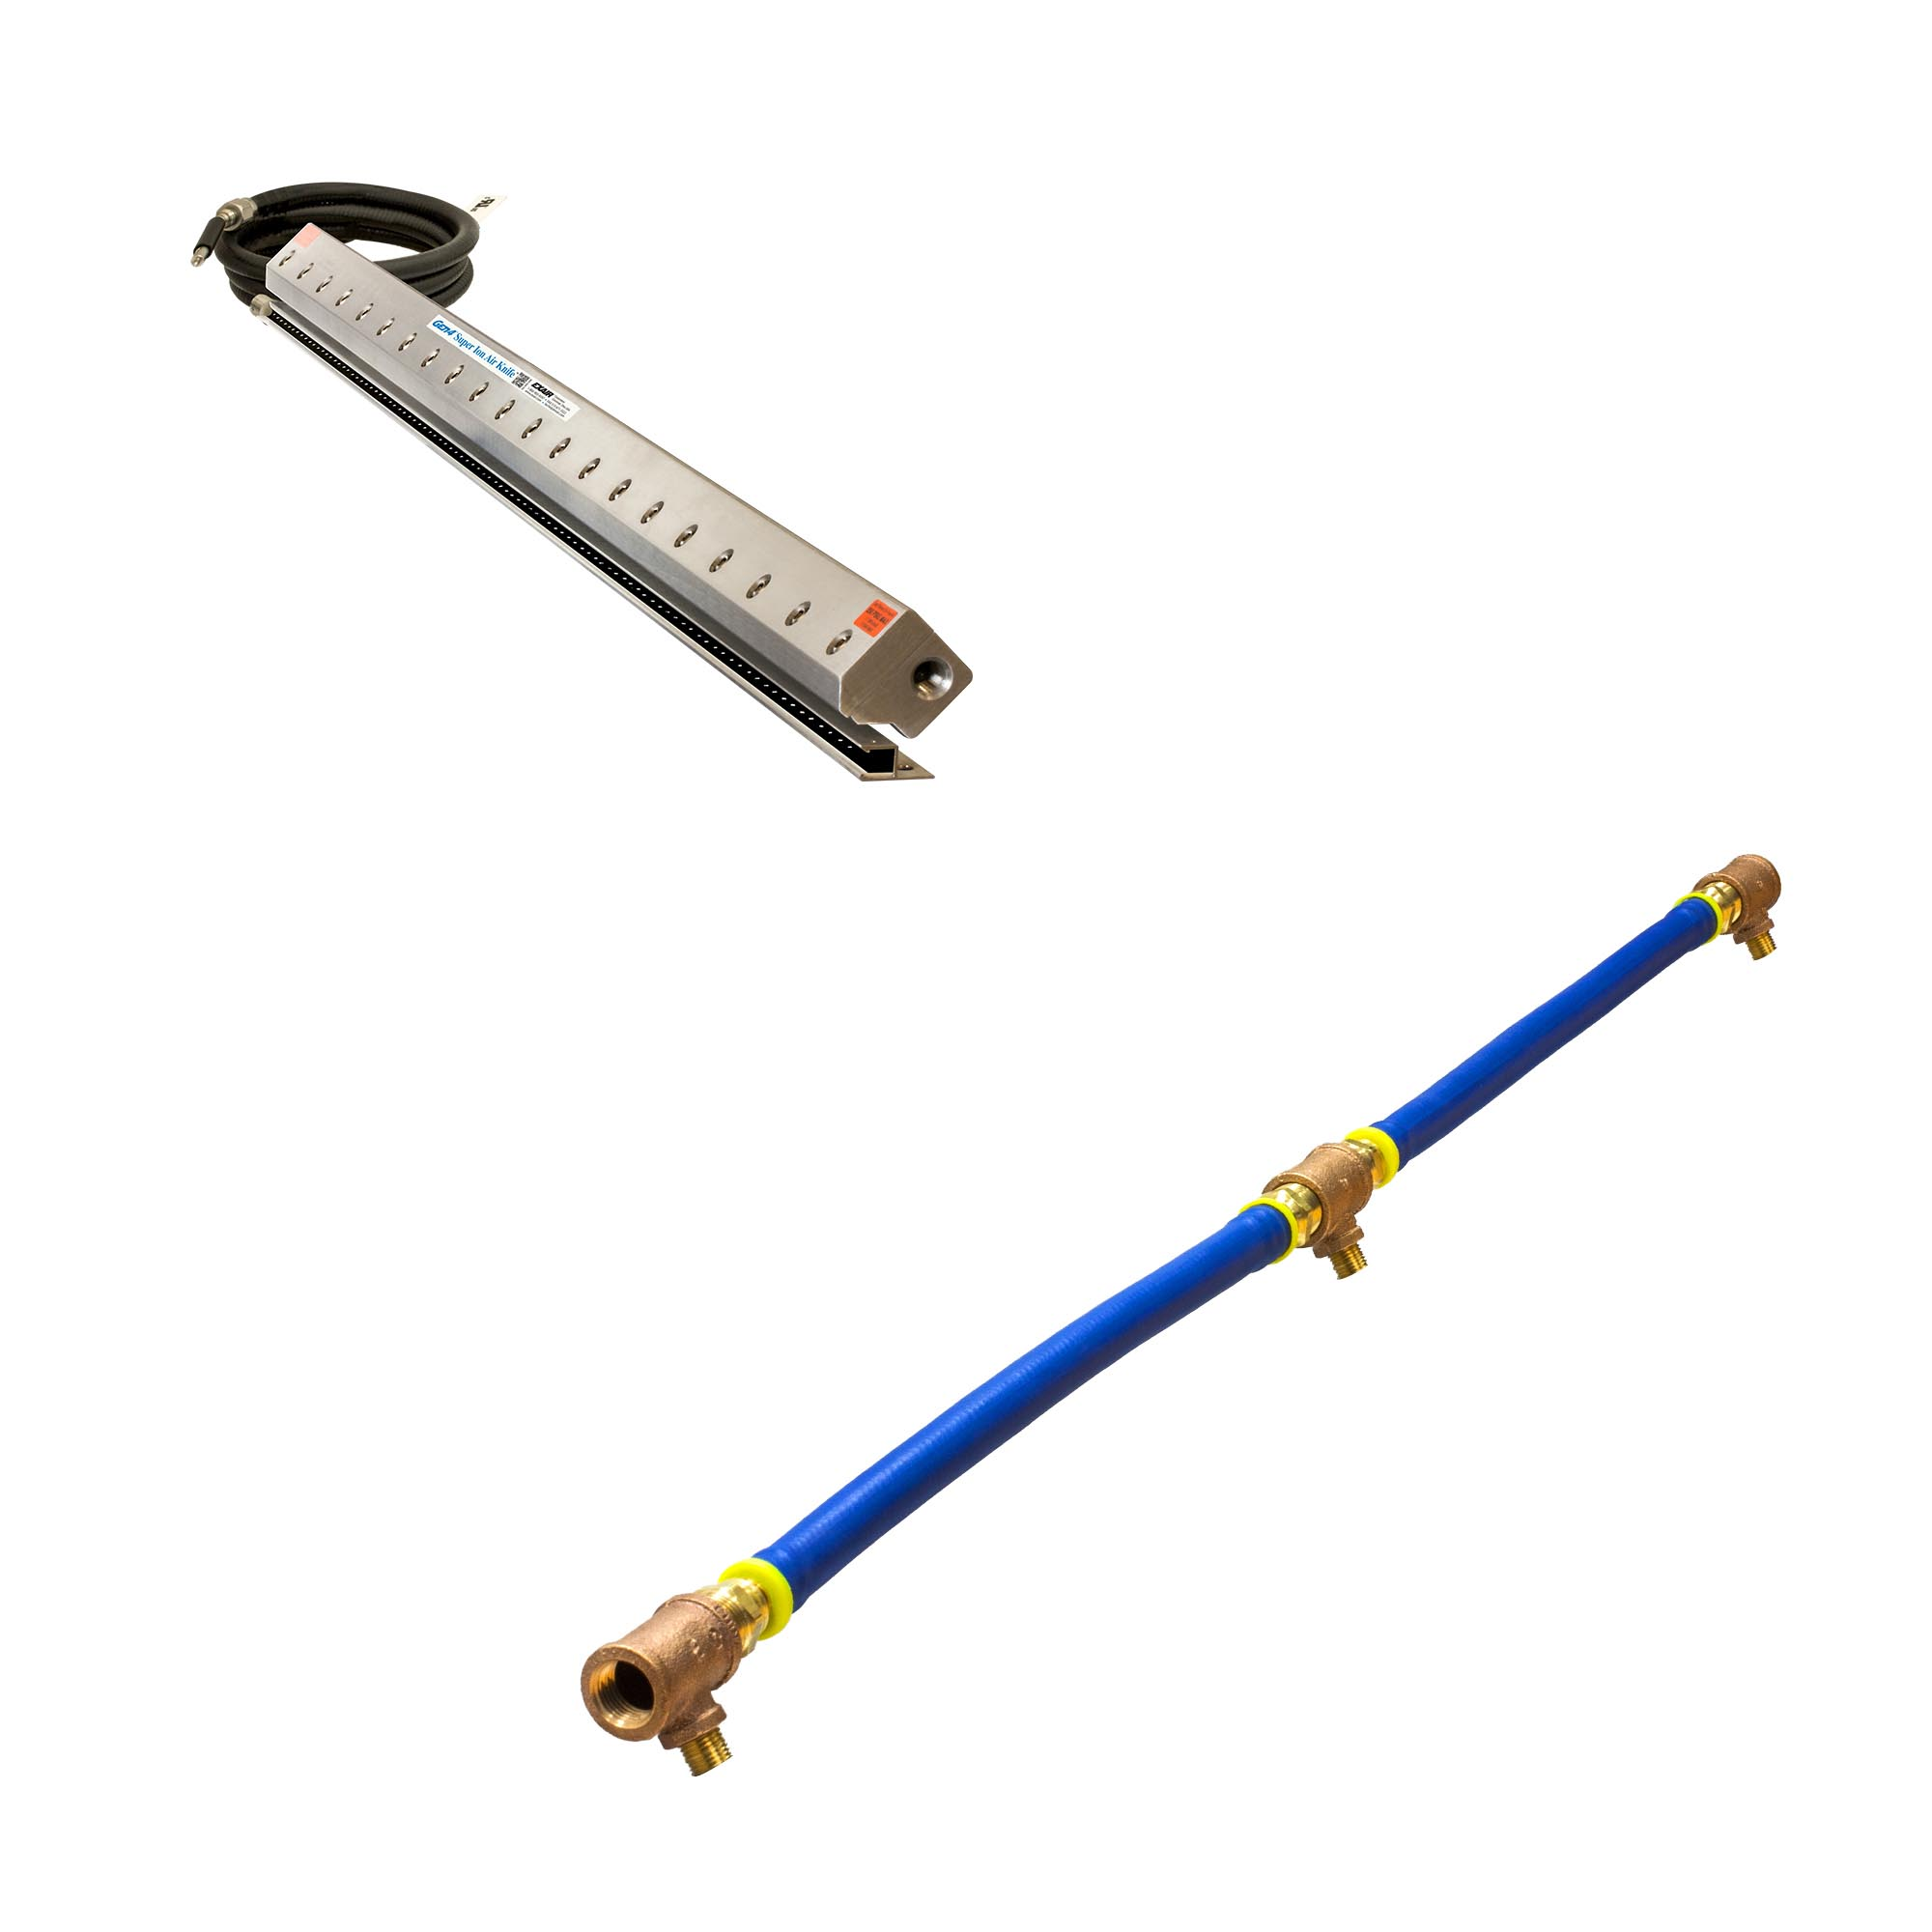 "Model 112060PKI 60"" Gen4 Super Ion Air Knife with Plumbing Kit"